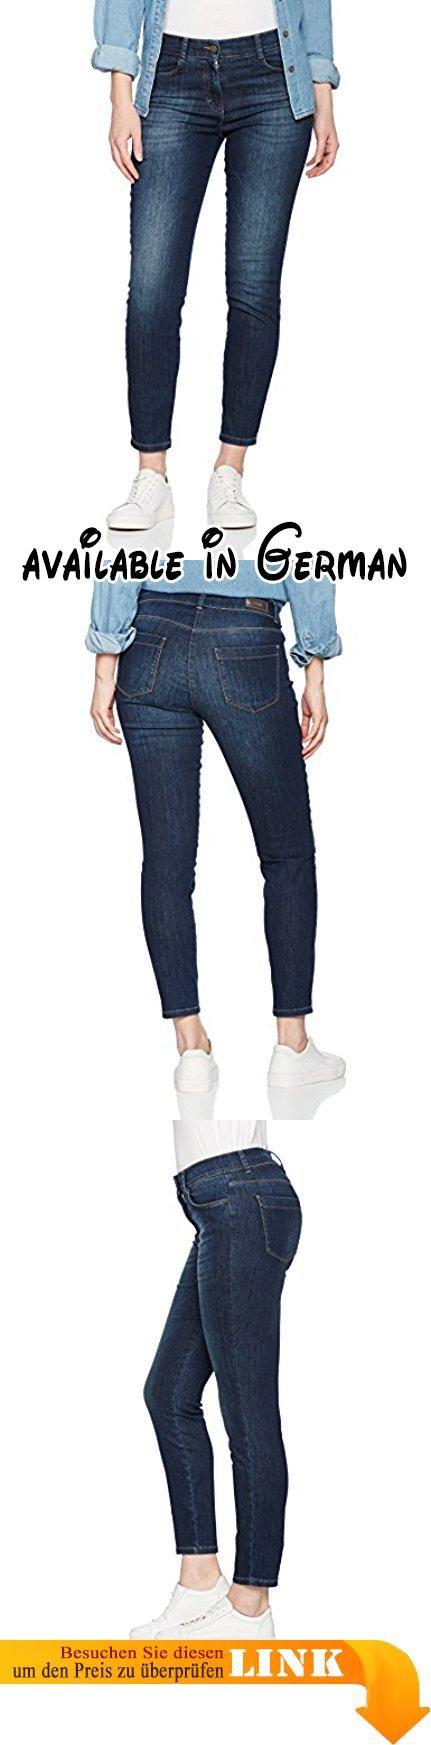 BRAX Damen Skinny Jeans Shakira Sharp, Blue (Used Dark Blue 25), W32/L32 (Herstellergröße: 42K). SHAKIRA SHARP. 25 #Apparel #PANTS